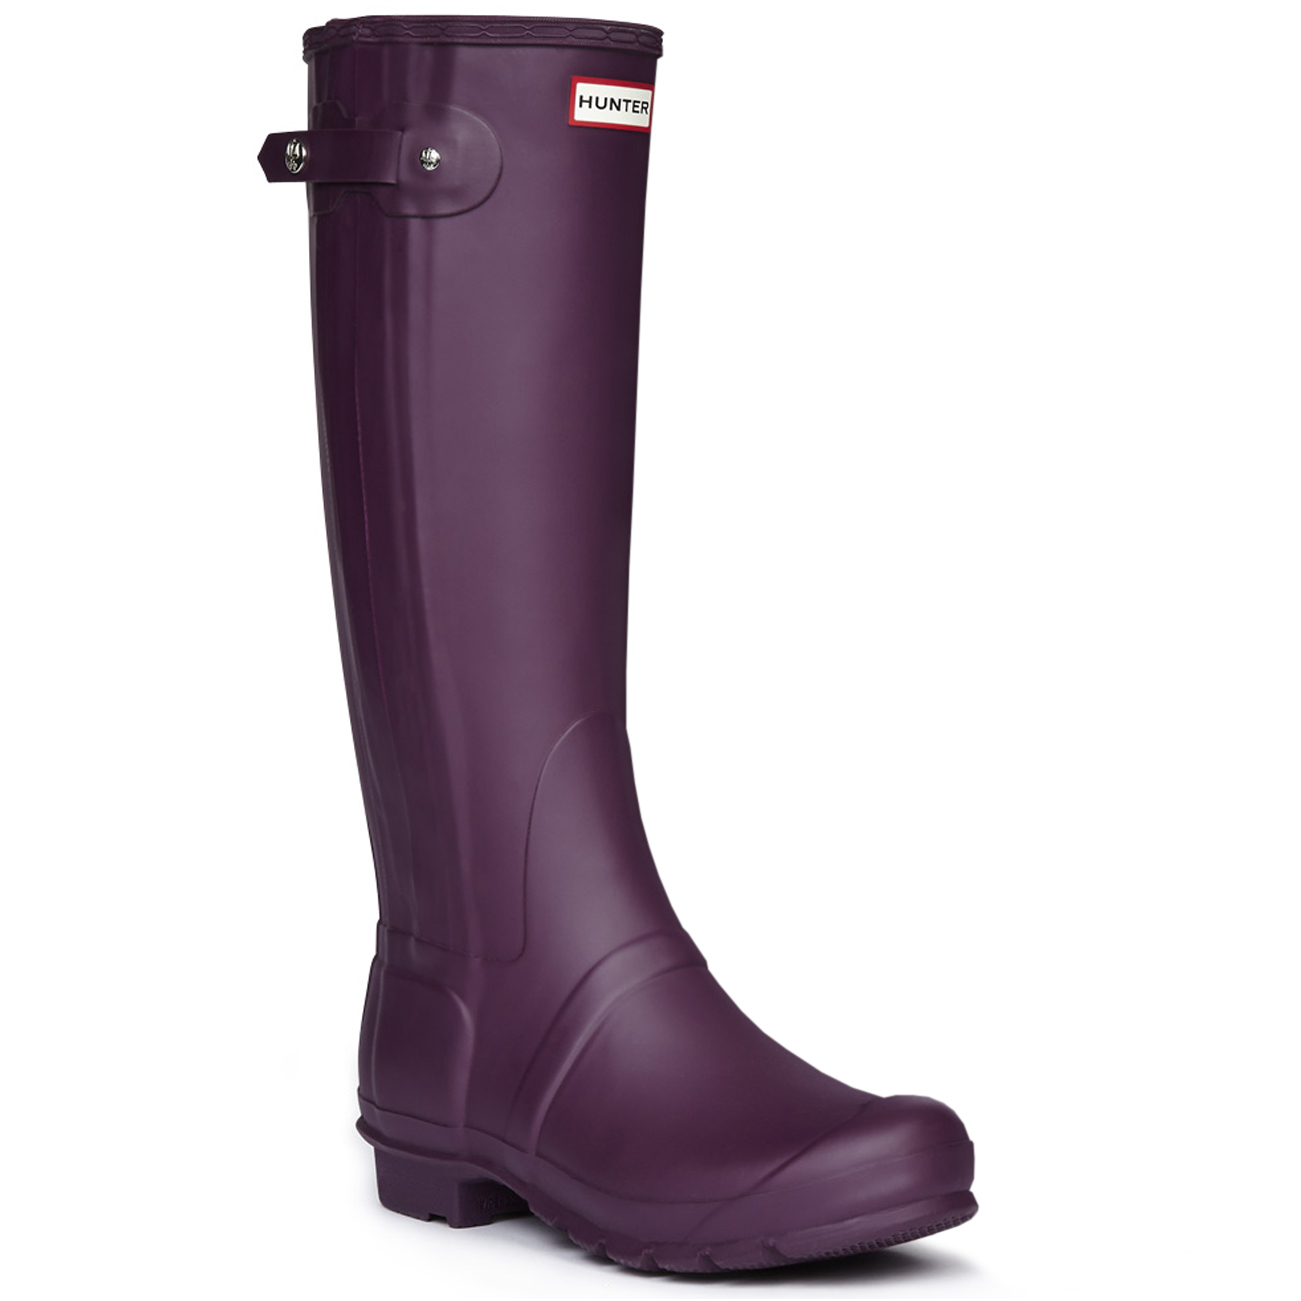 Creative WOMENS HUNTER WELLINGTON BOOTS ORIGINAL TALL RAIN SNOW WELLIES LADIES UK 3-8 | EBay